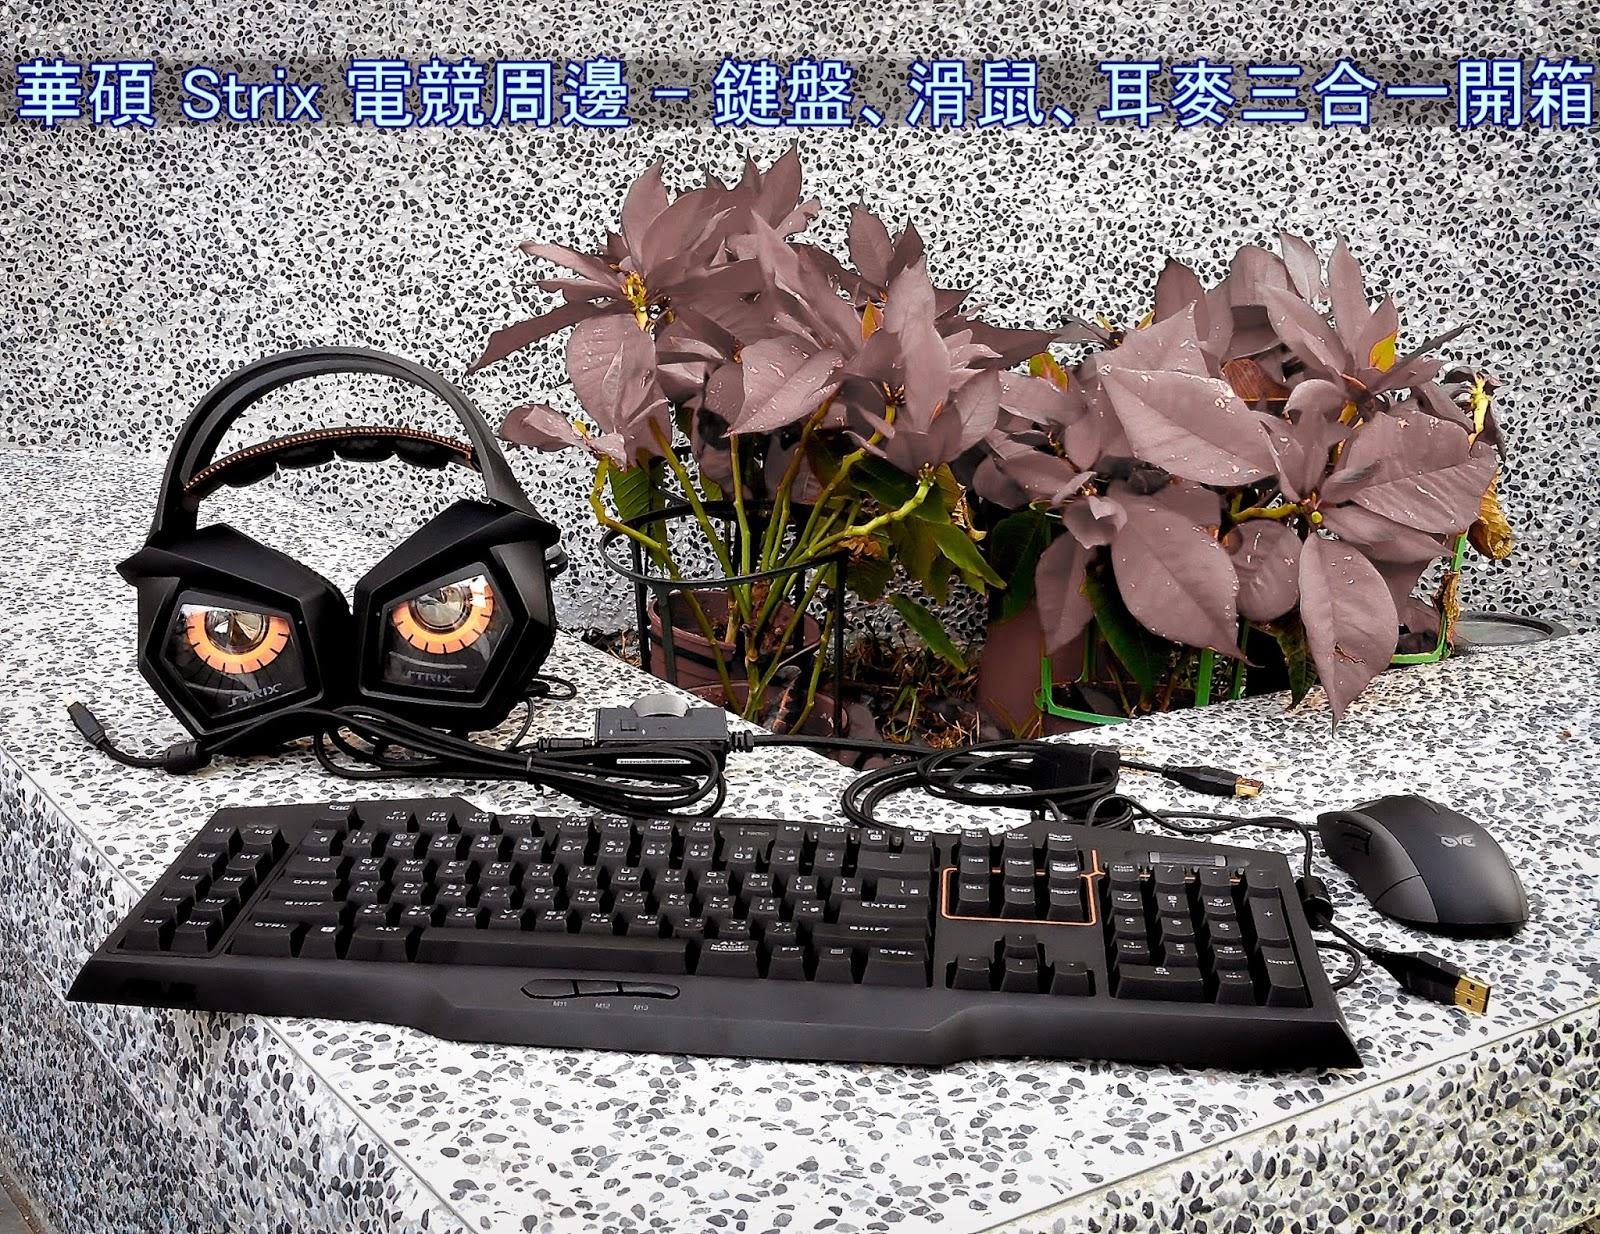 ASUS STRIX電競三劍客開箱 - 追求如隼鷹精準的鍵盤、滑鼠、耳麥